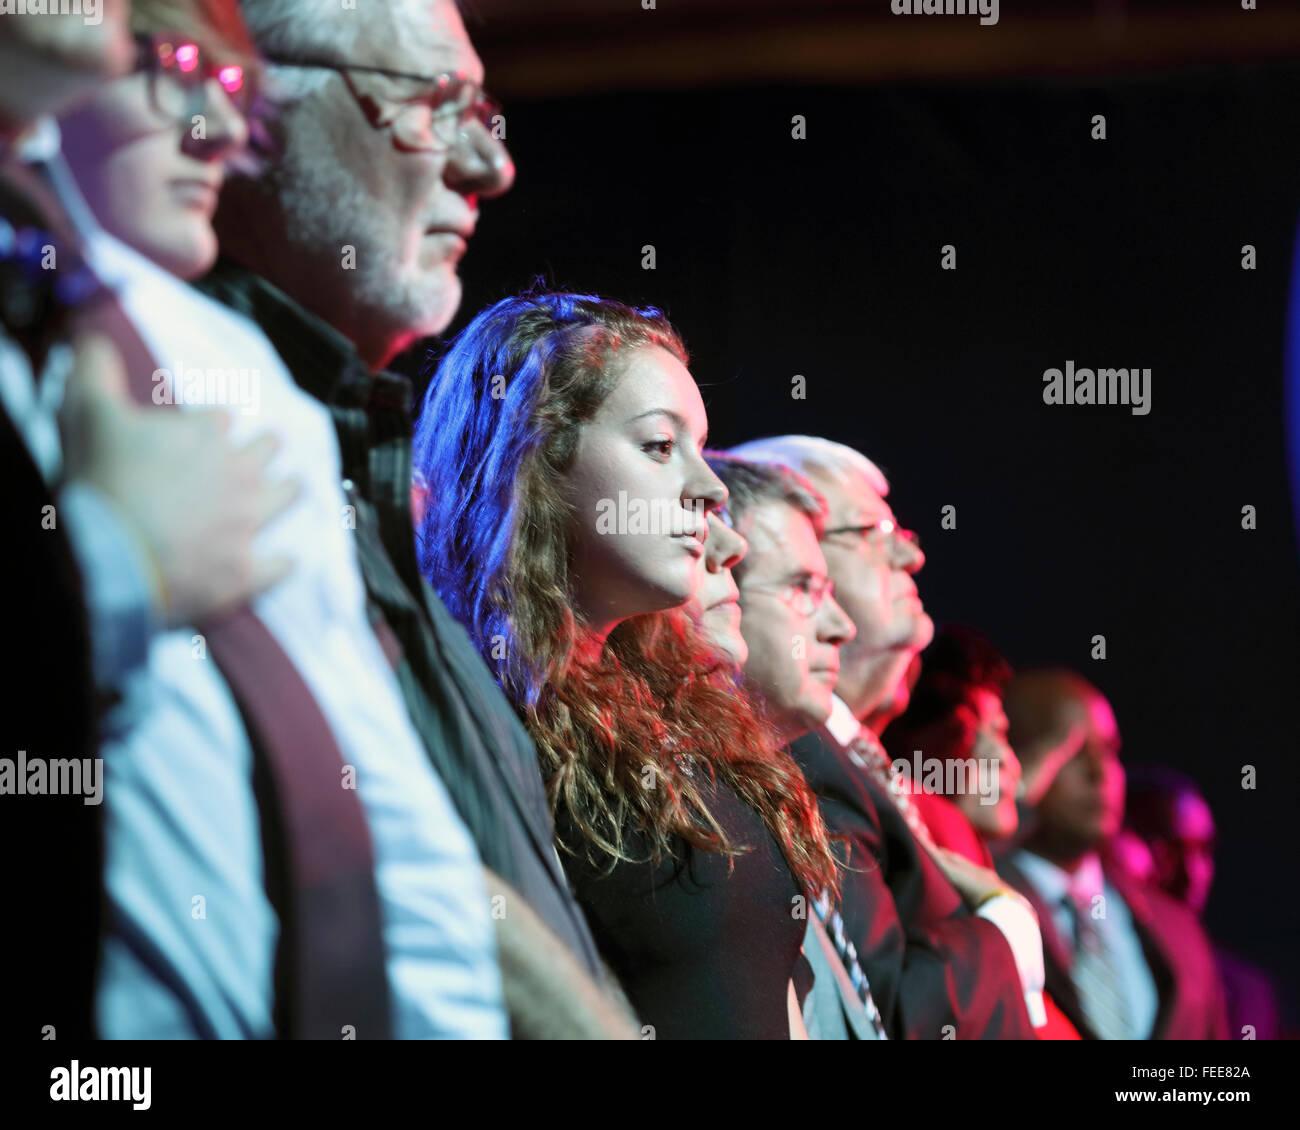 LAS VEGAS, NV - OCTOBER 13 2015: (L-R) Democratic presidential debate shows audience during opening pledge of allegiance. - Stock Image